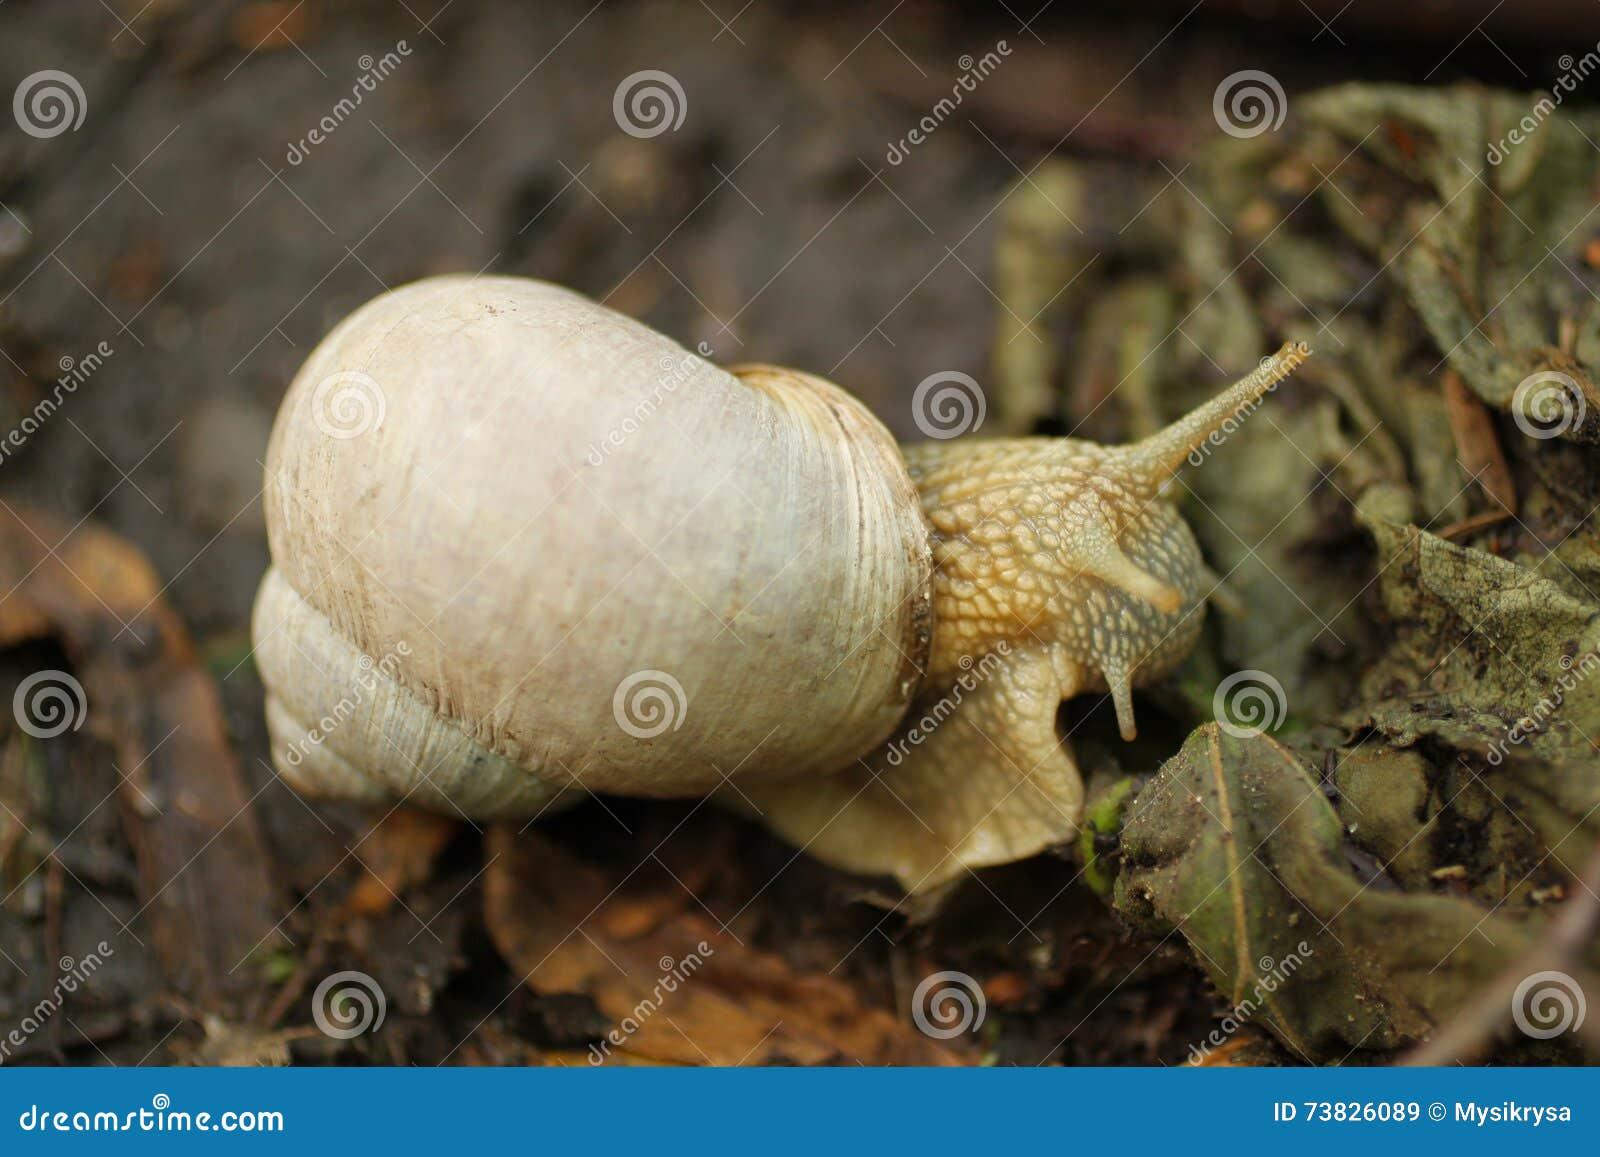 Edible snail eating leaf stock image. Image of gastropod - 73826089